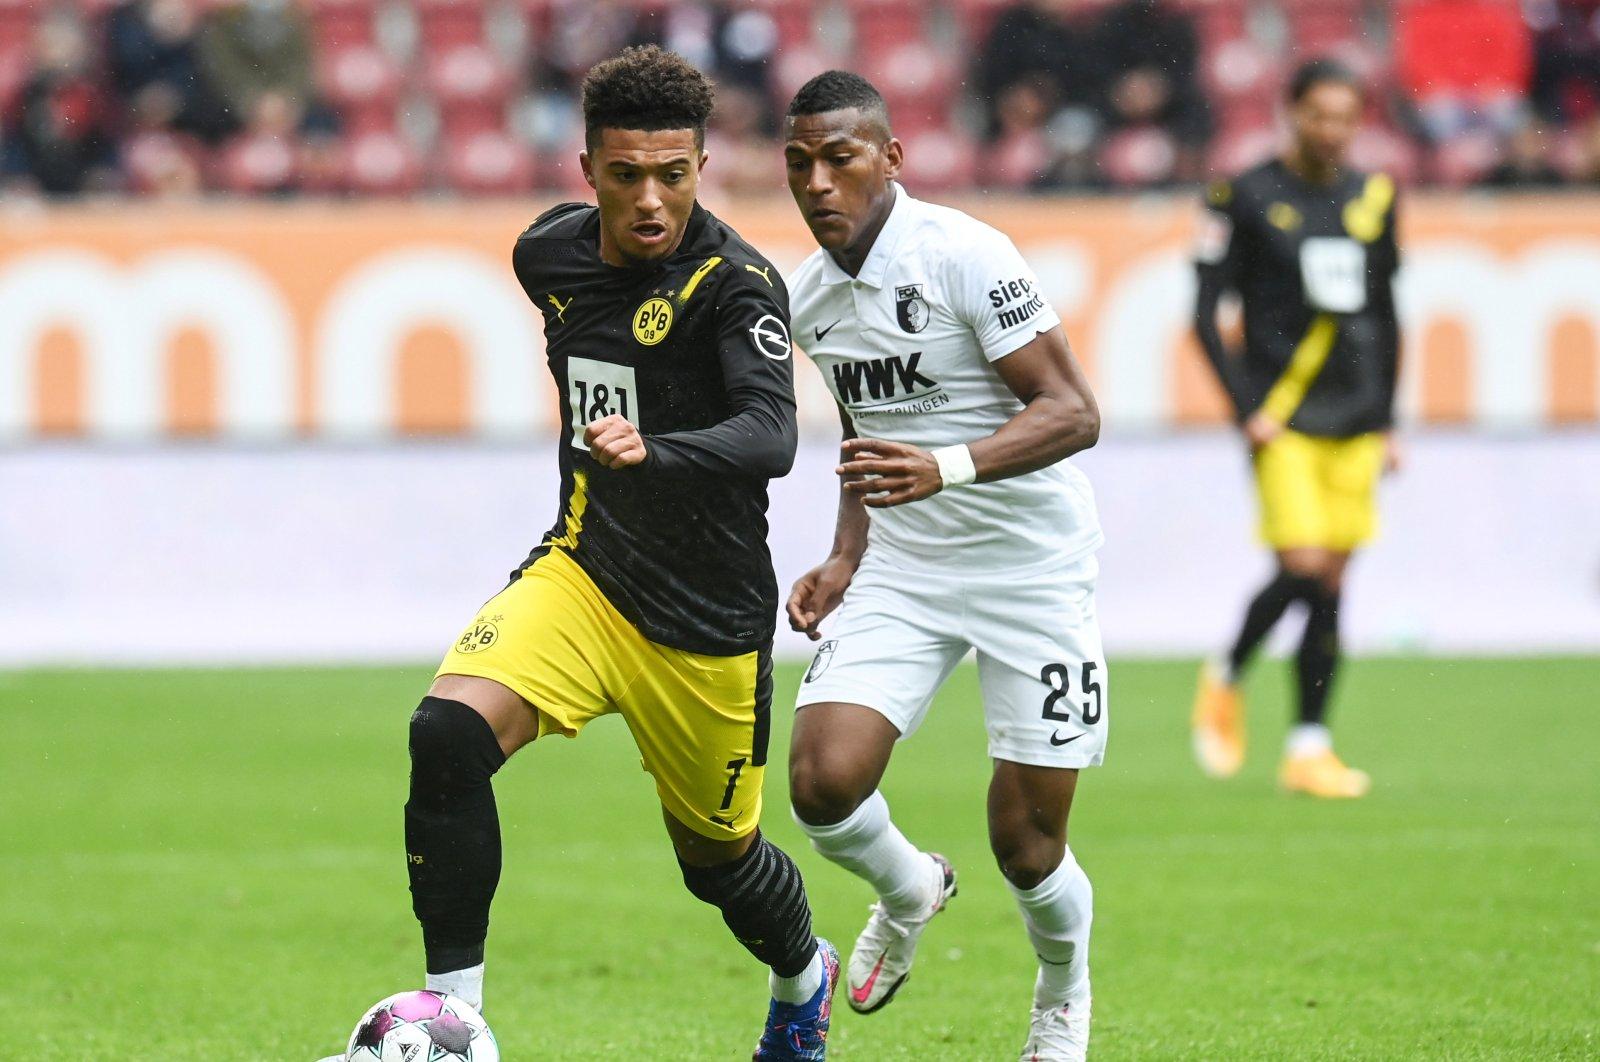 Borussia Dortmund's Jadon Sancho in action with FC Augsburg's Carlos Gruezo, Augsburg, Germany, Sept. 26, 2020. (Reuters Photo)